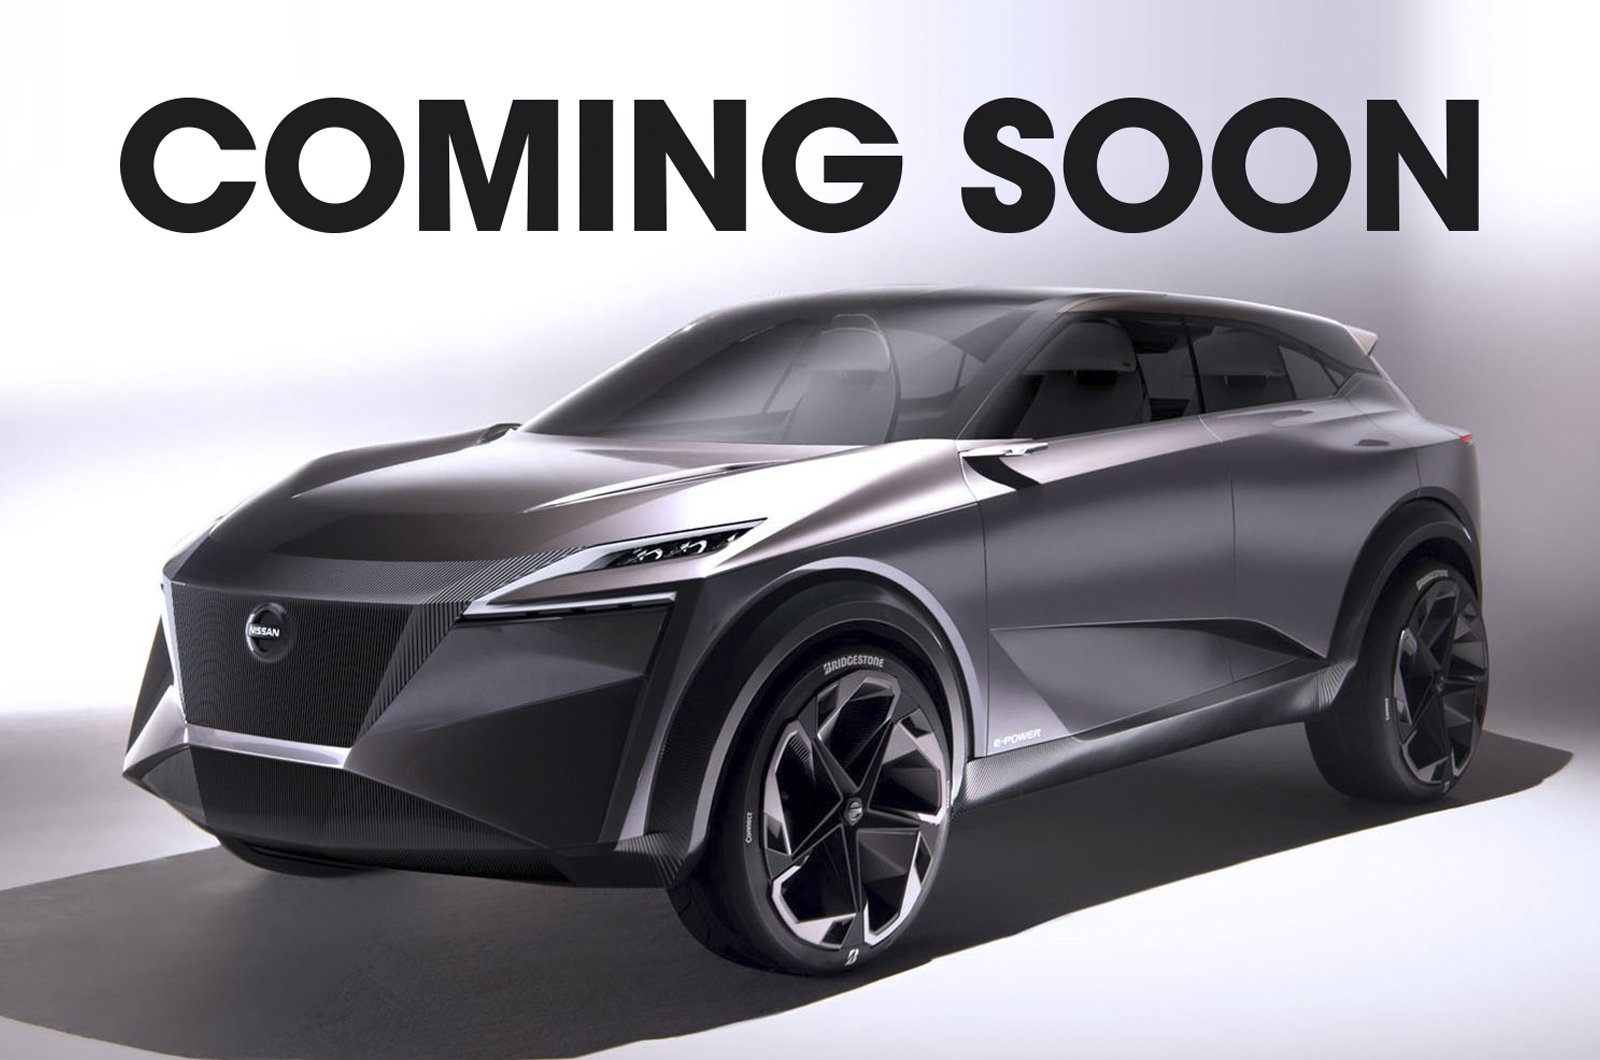 2020 Nissan Qashqai - coming soon